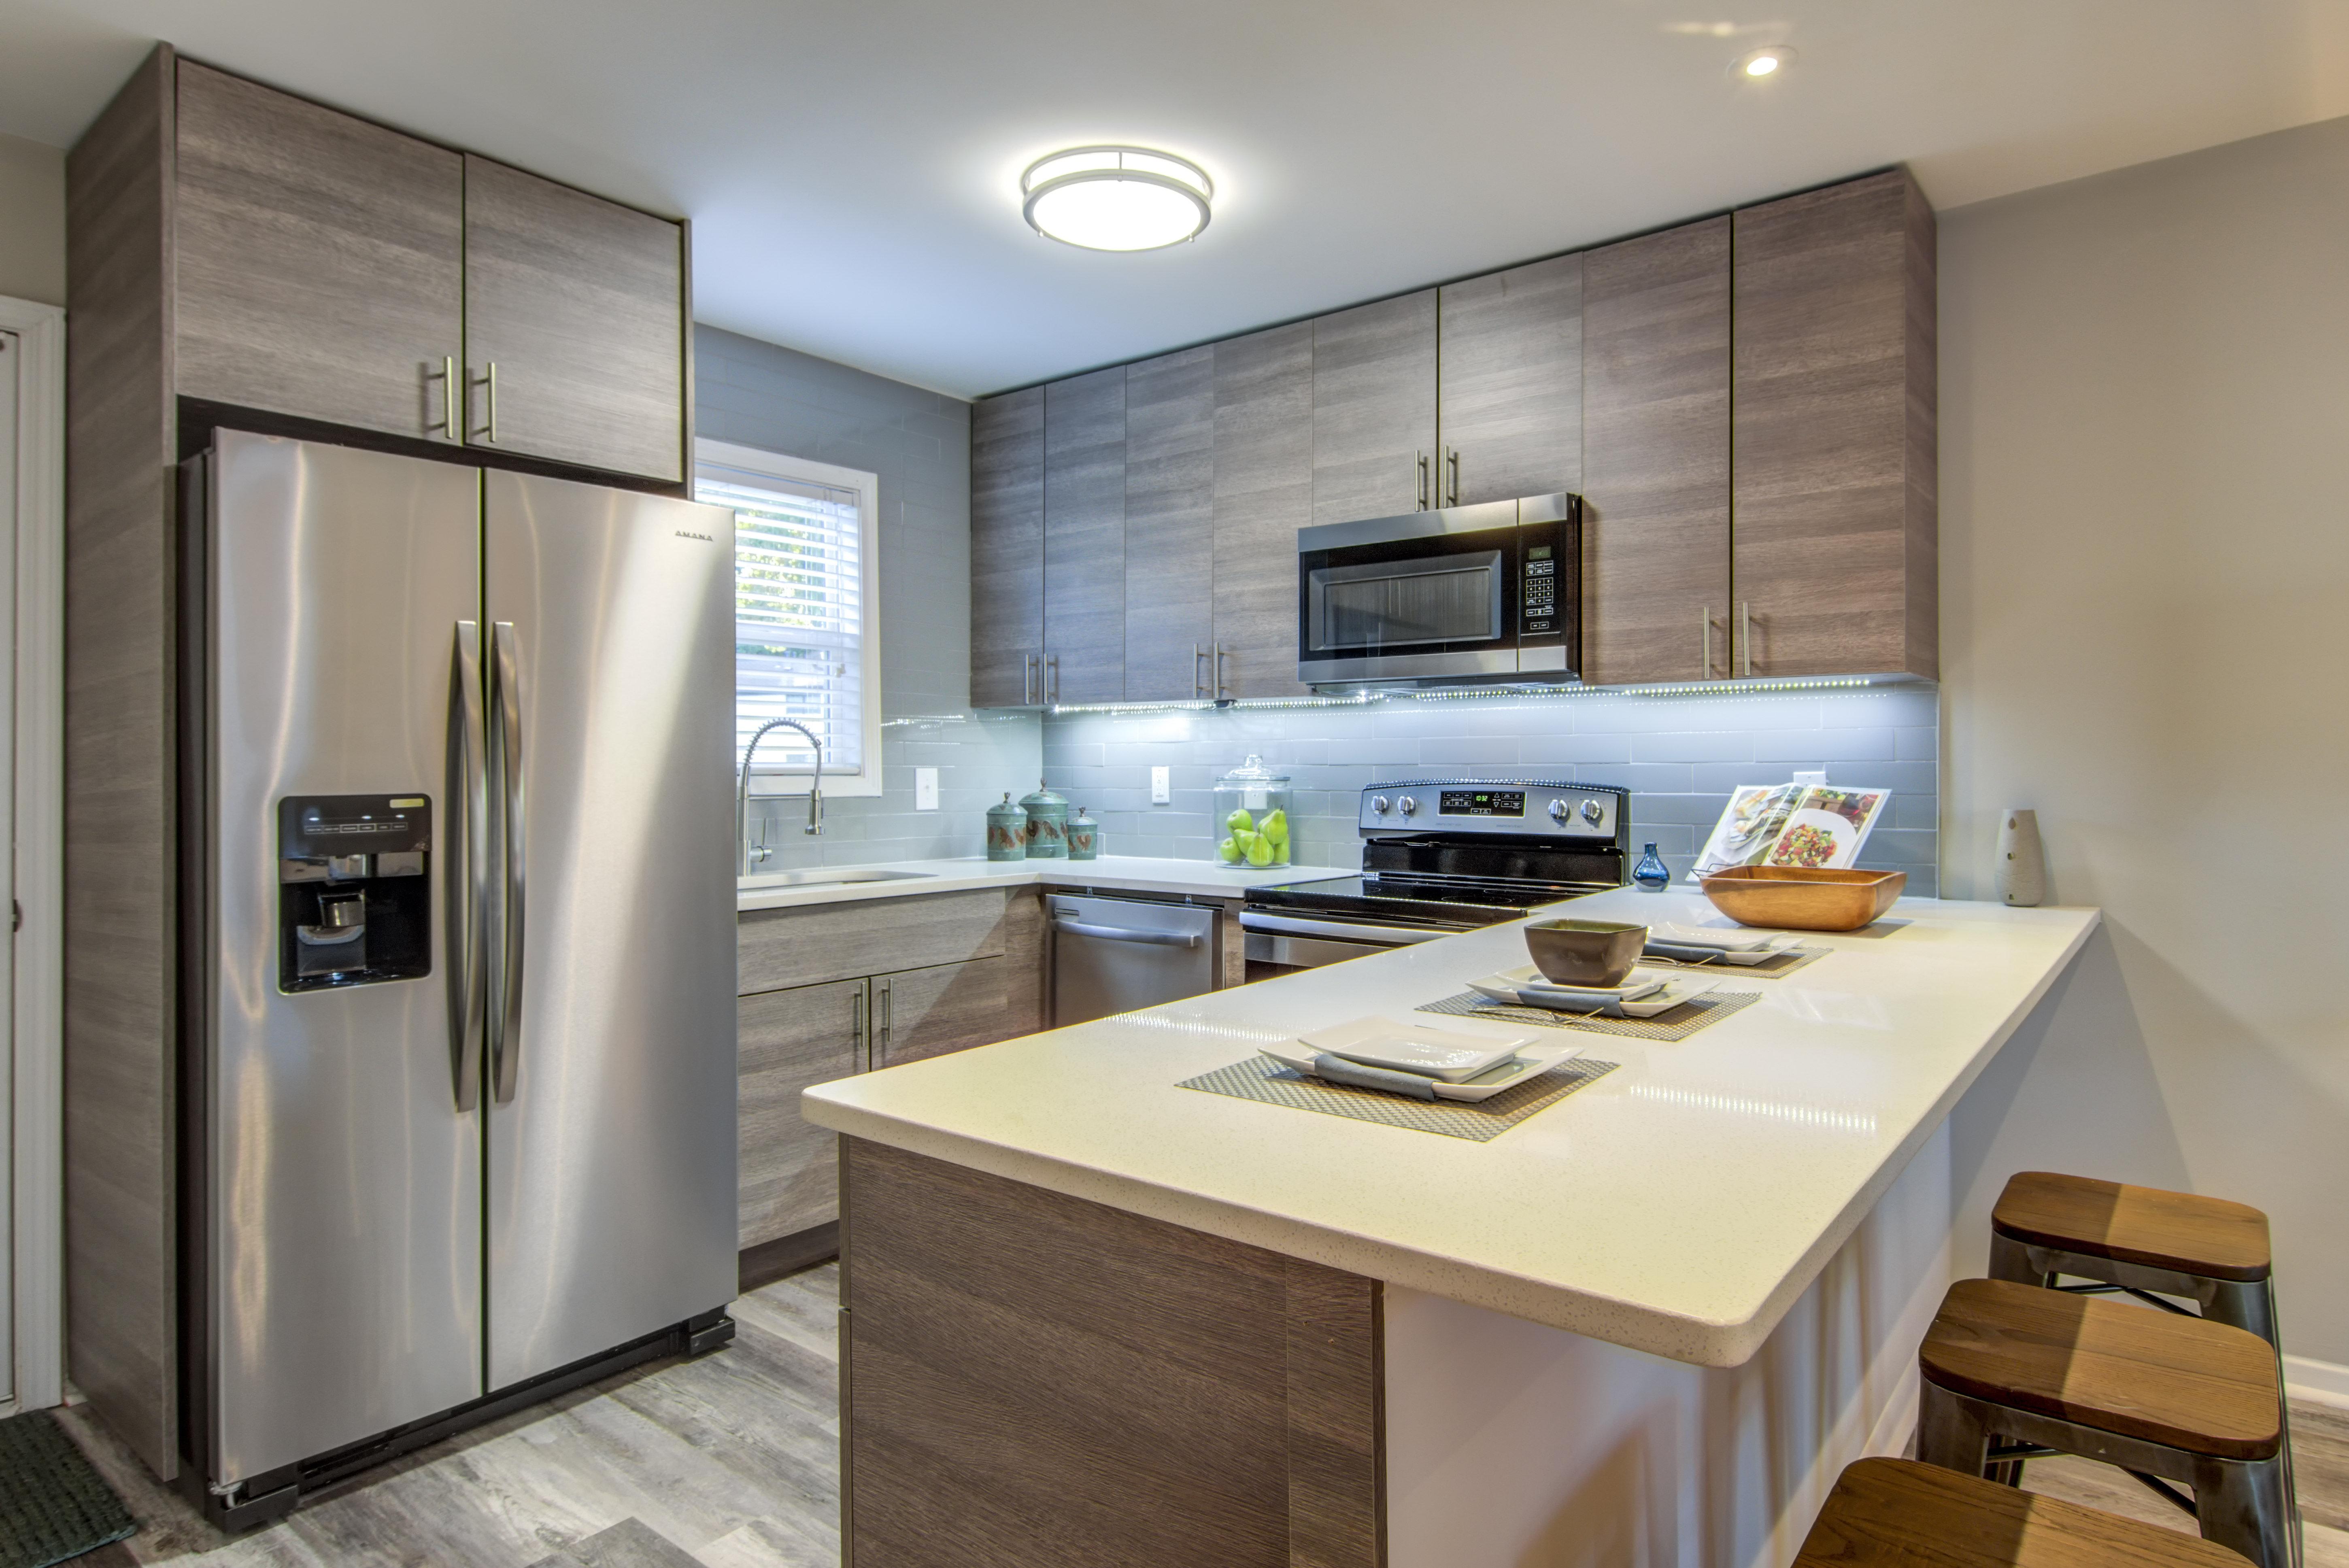 Tremendous 100 Best Apartments In Atlanta Ga With Pictures Download Free Architecture Designs Rallybritishbridgeorg